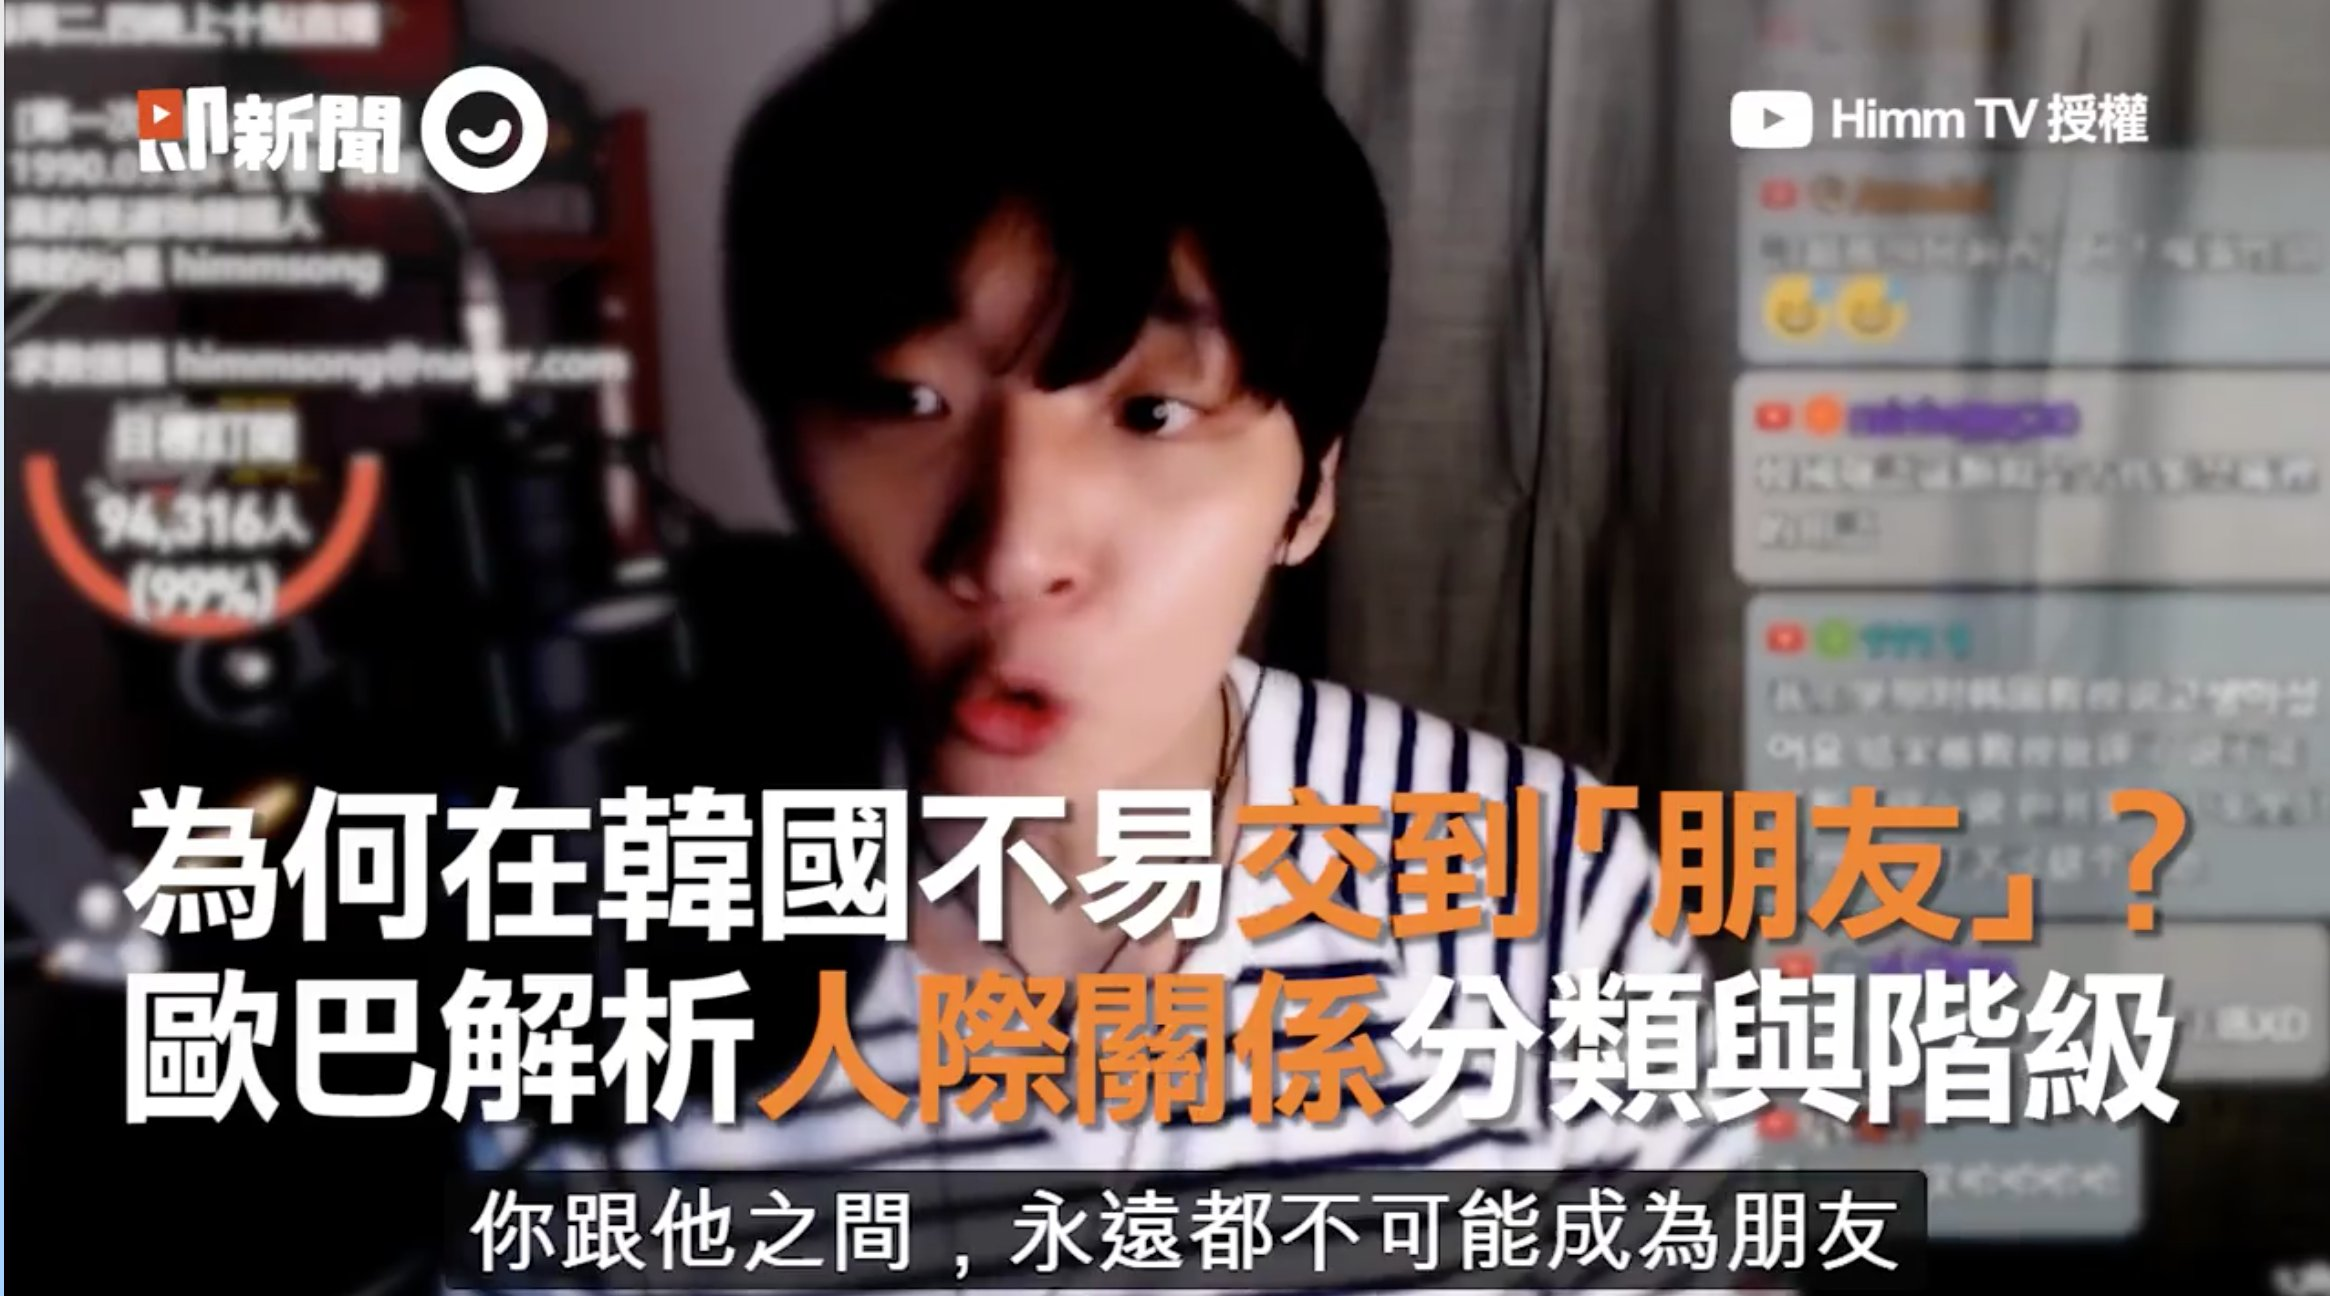 screen shot 2018 10 03 at 4 40 19 pm.png?resize=412,232 - 為何在韓國不易交到「朋友」? 歐爸解析韓國人際生態:「一句話定生死!」